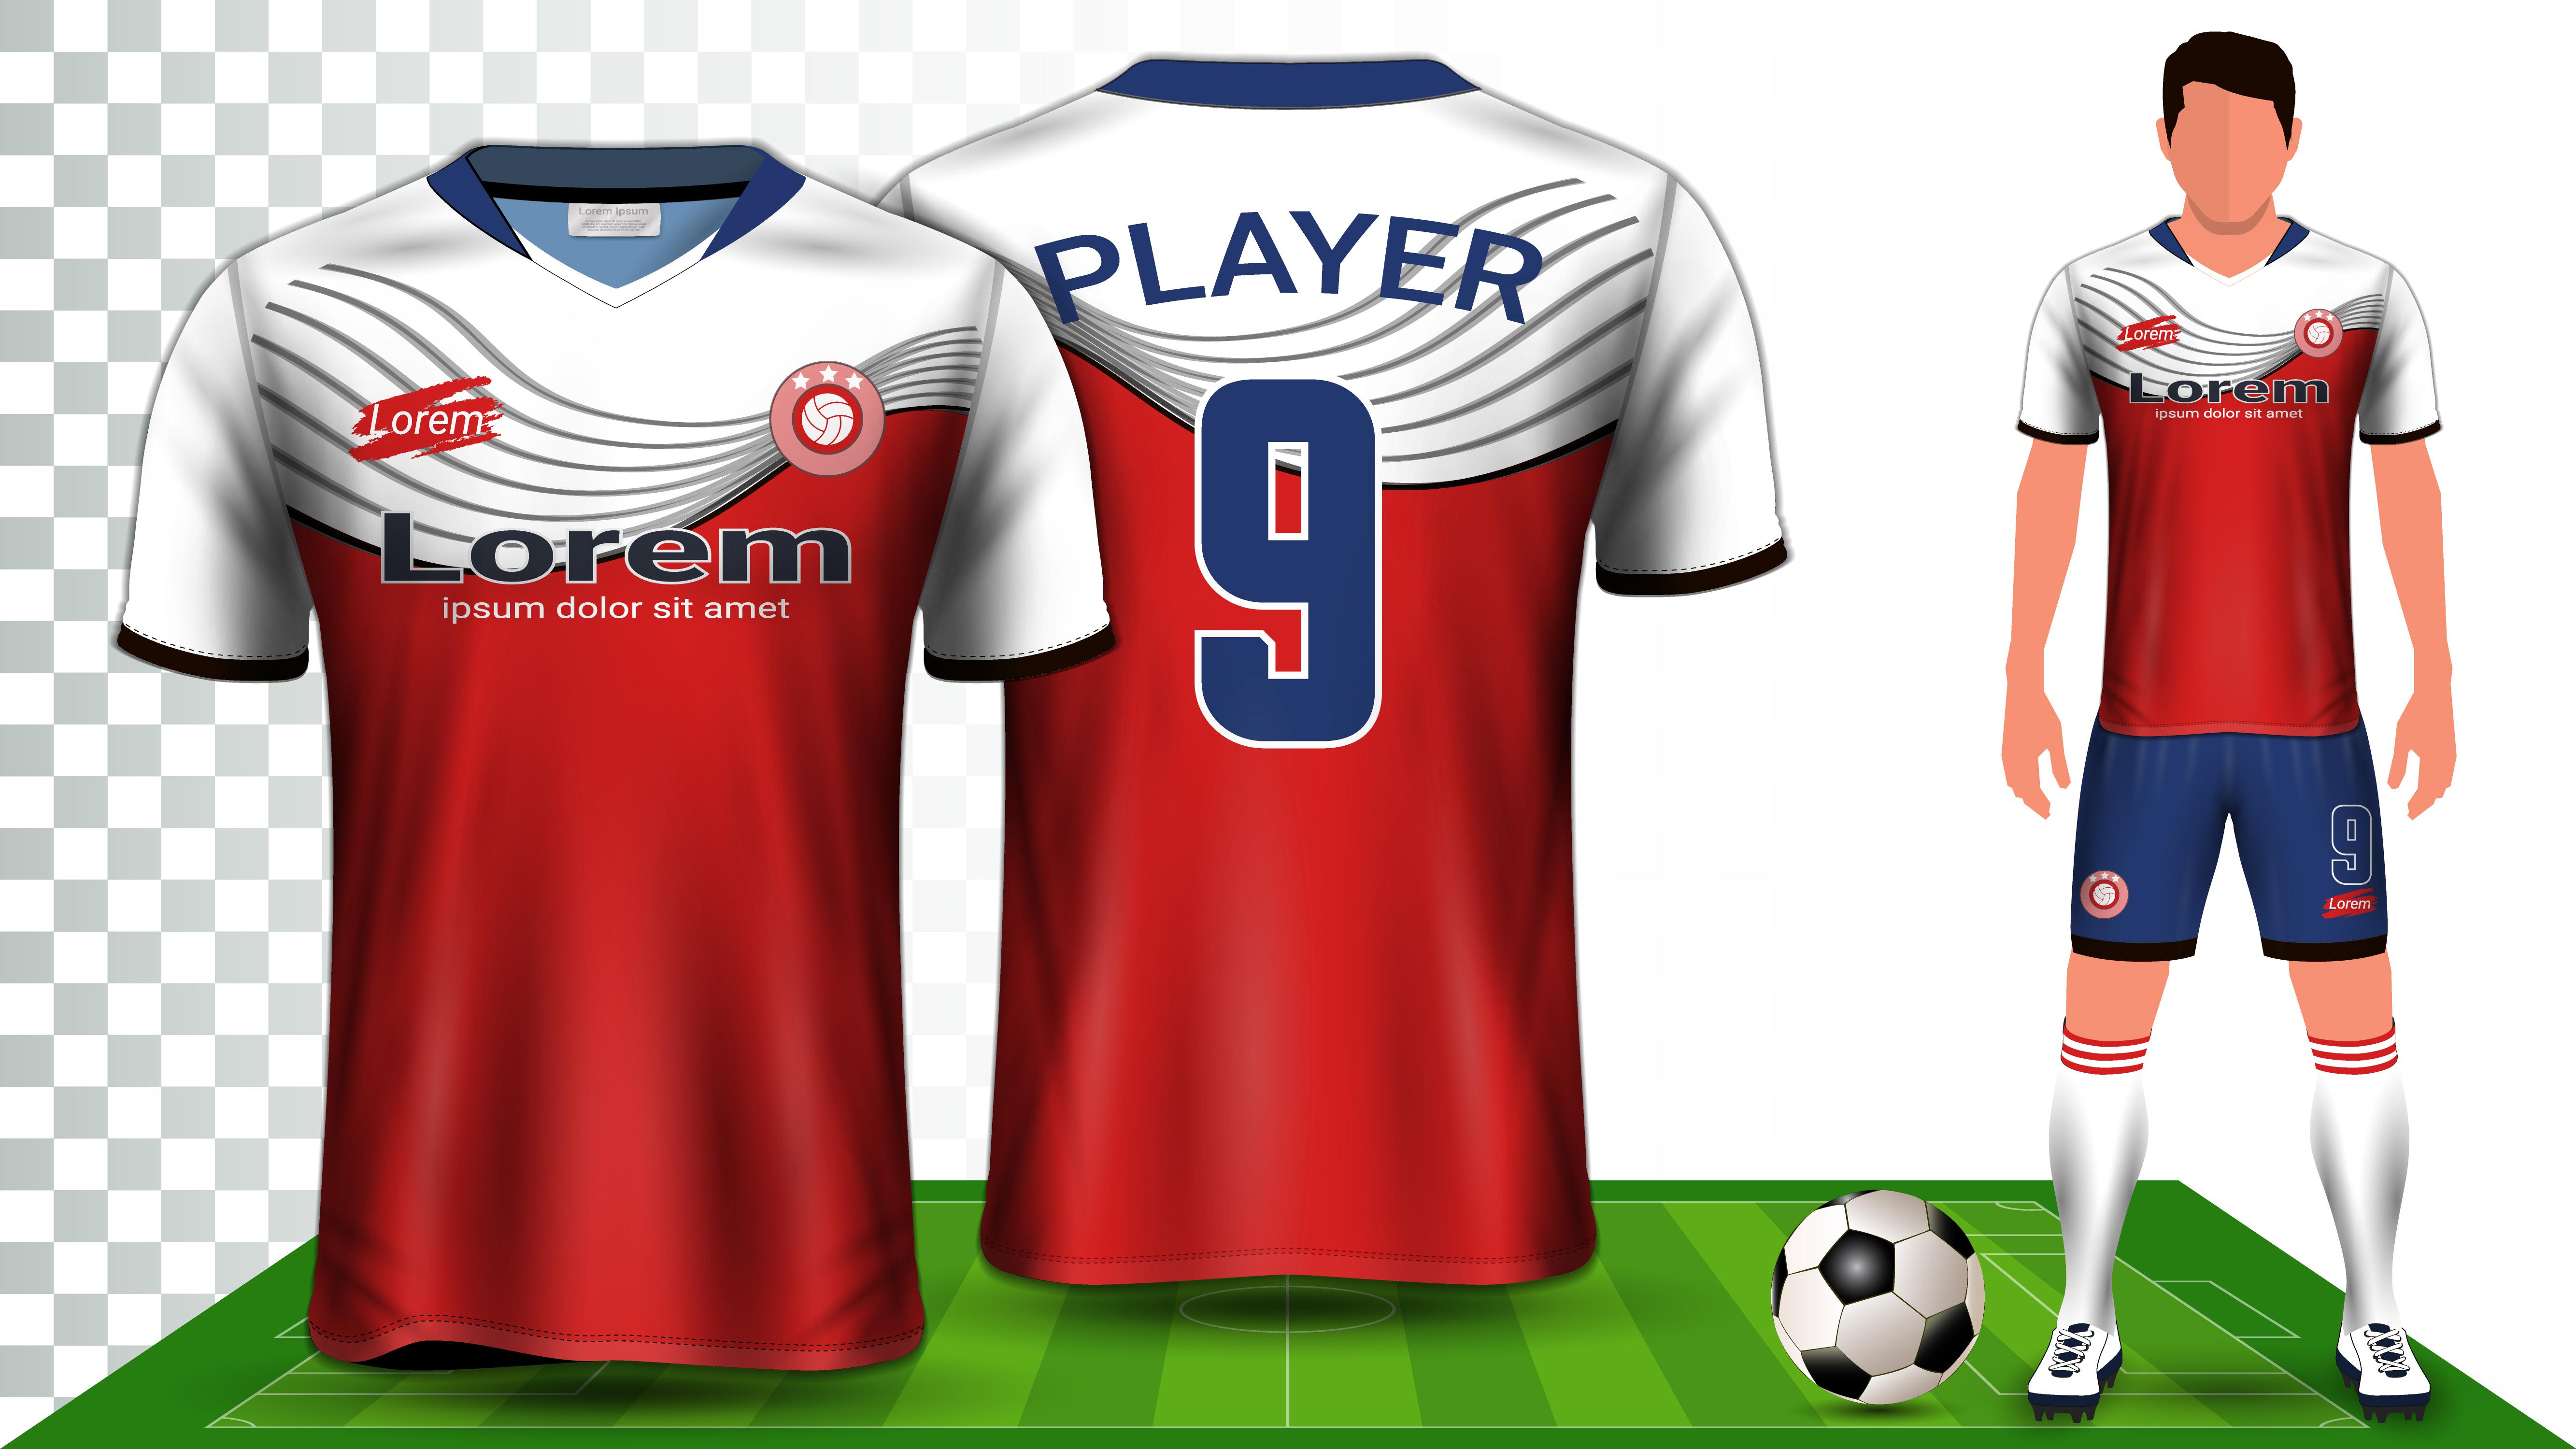 soccer jersey sport shirt or football kit uniform presentation mockup template vector